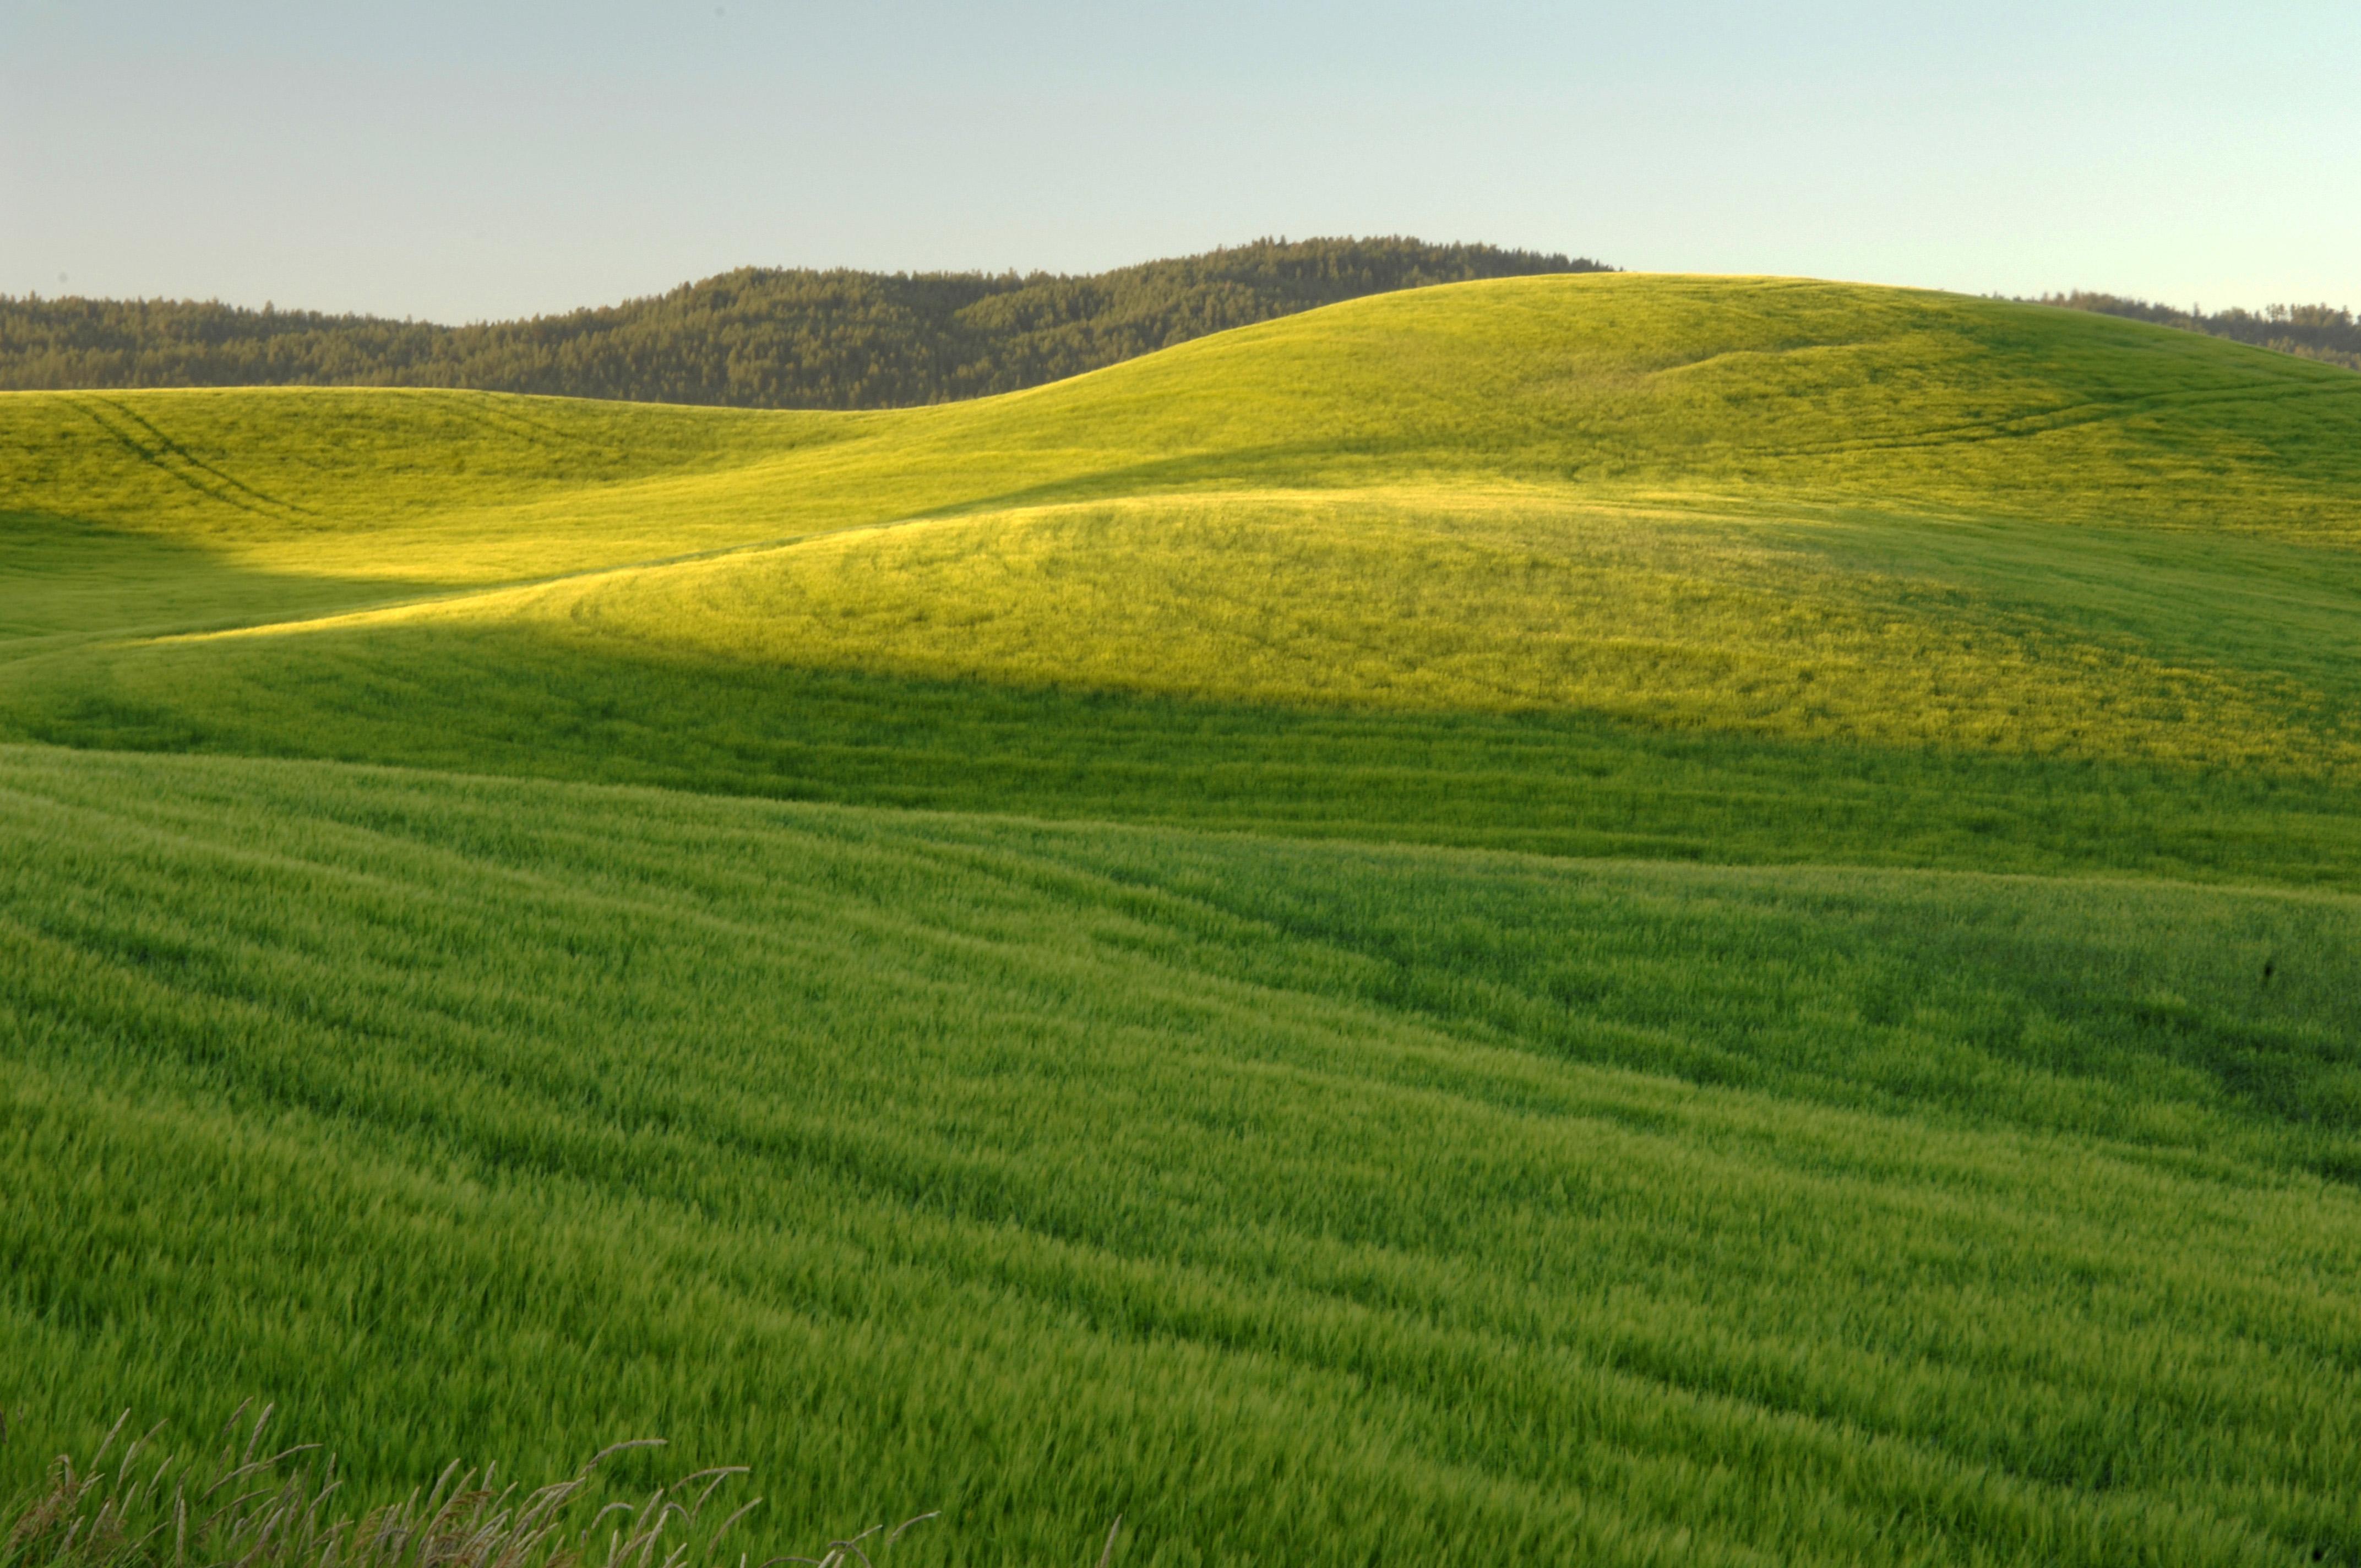 Green Grassy Hills Landscape Image Free Stock Photo Public